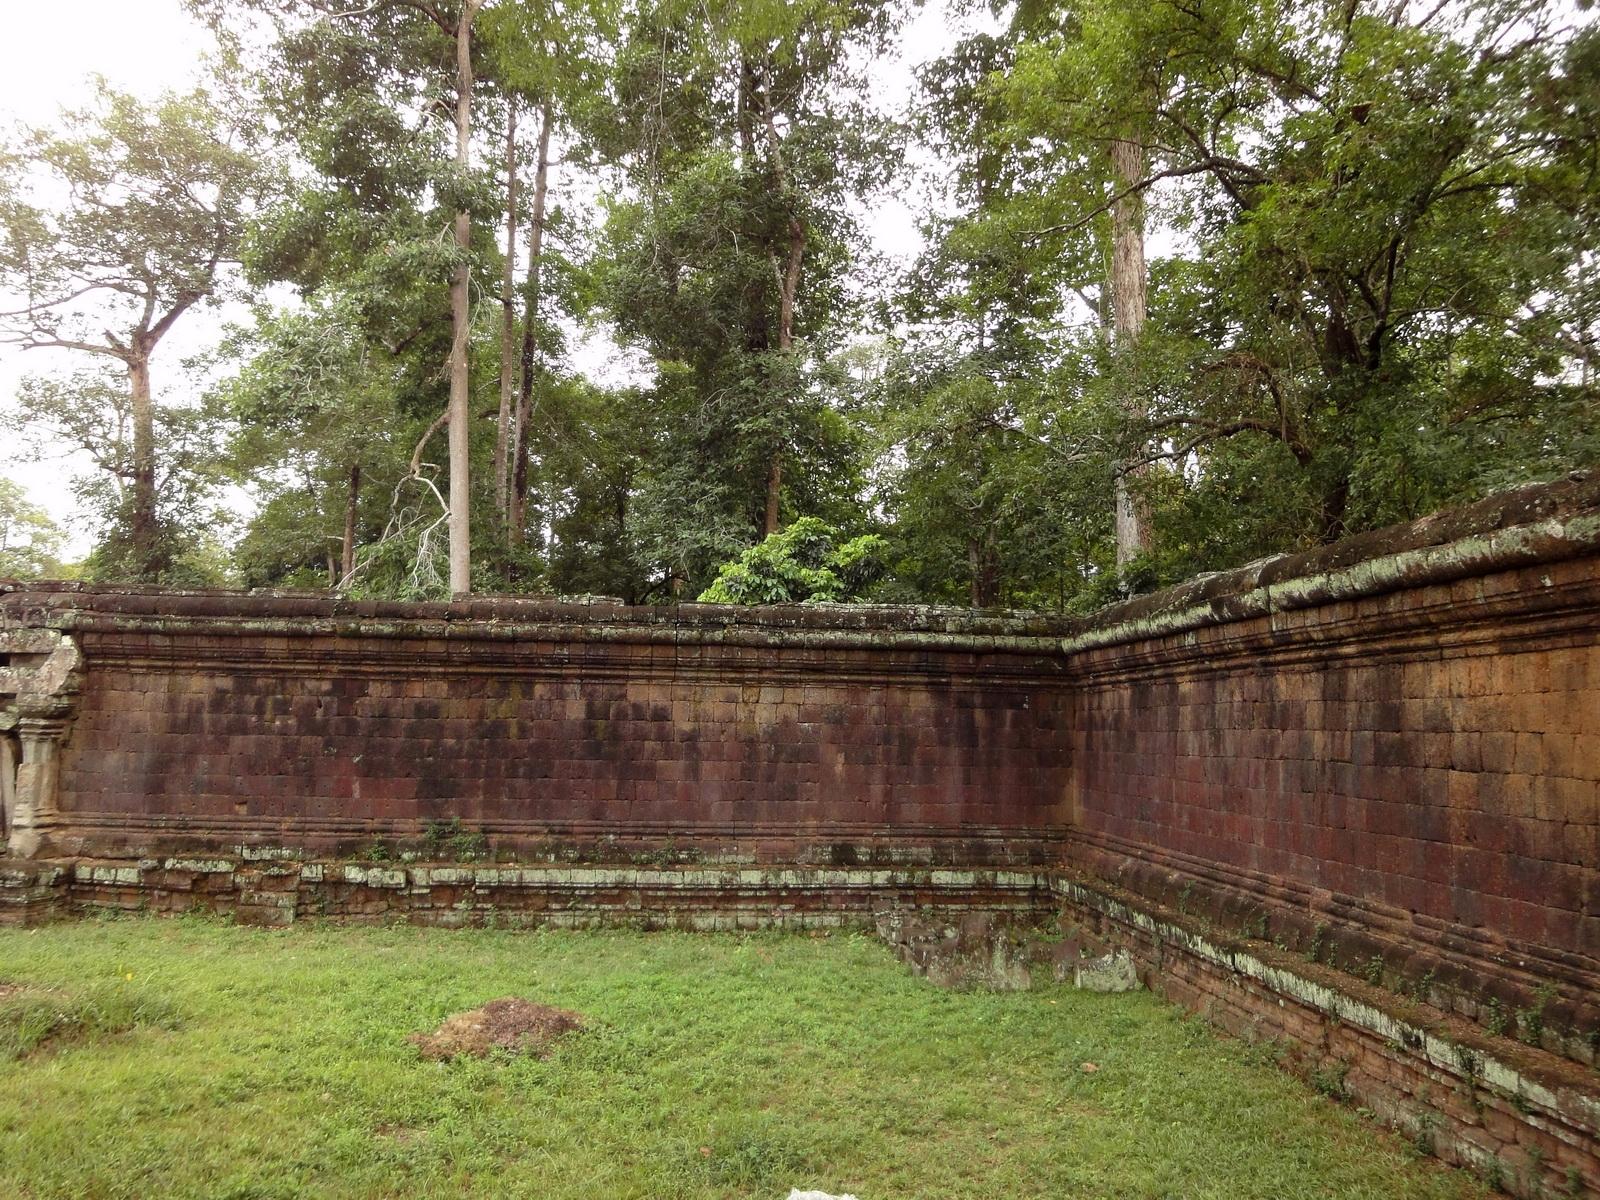 Terrace of the Elephants terrace views Angkor Thom 16